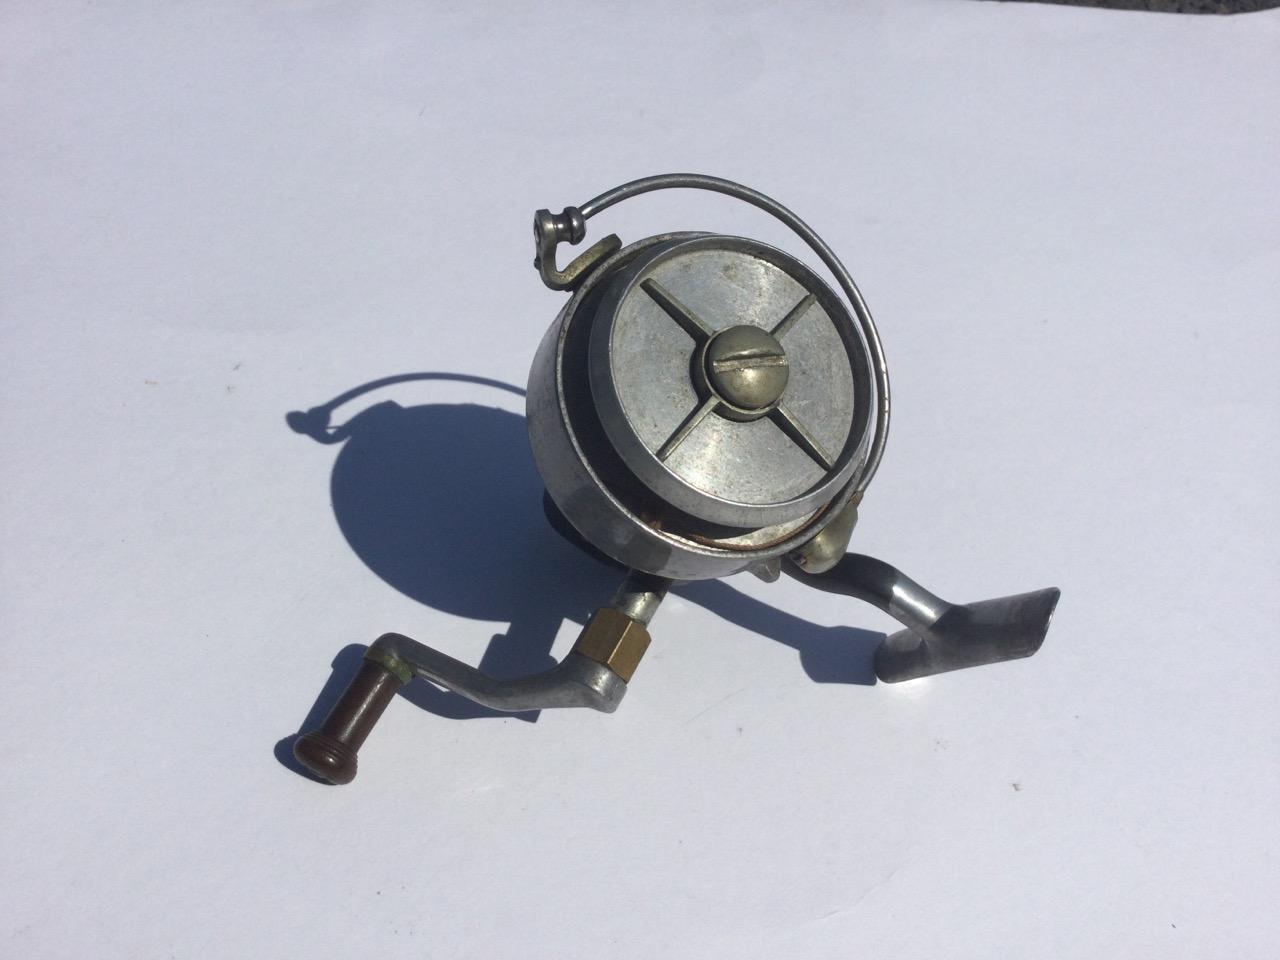 A Hardy Altex spinning reel, No 2 Mark V, having grey metallic body and folding handle.